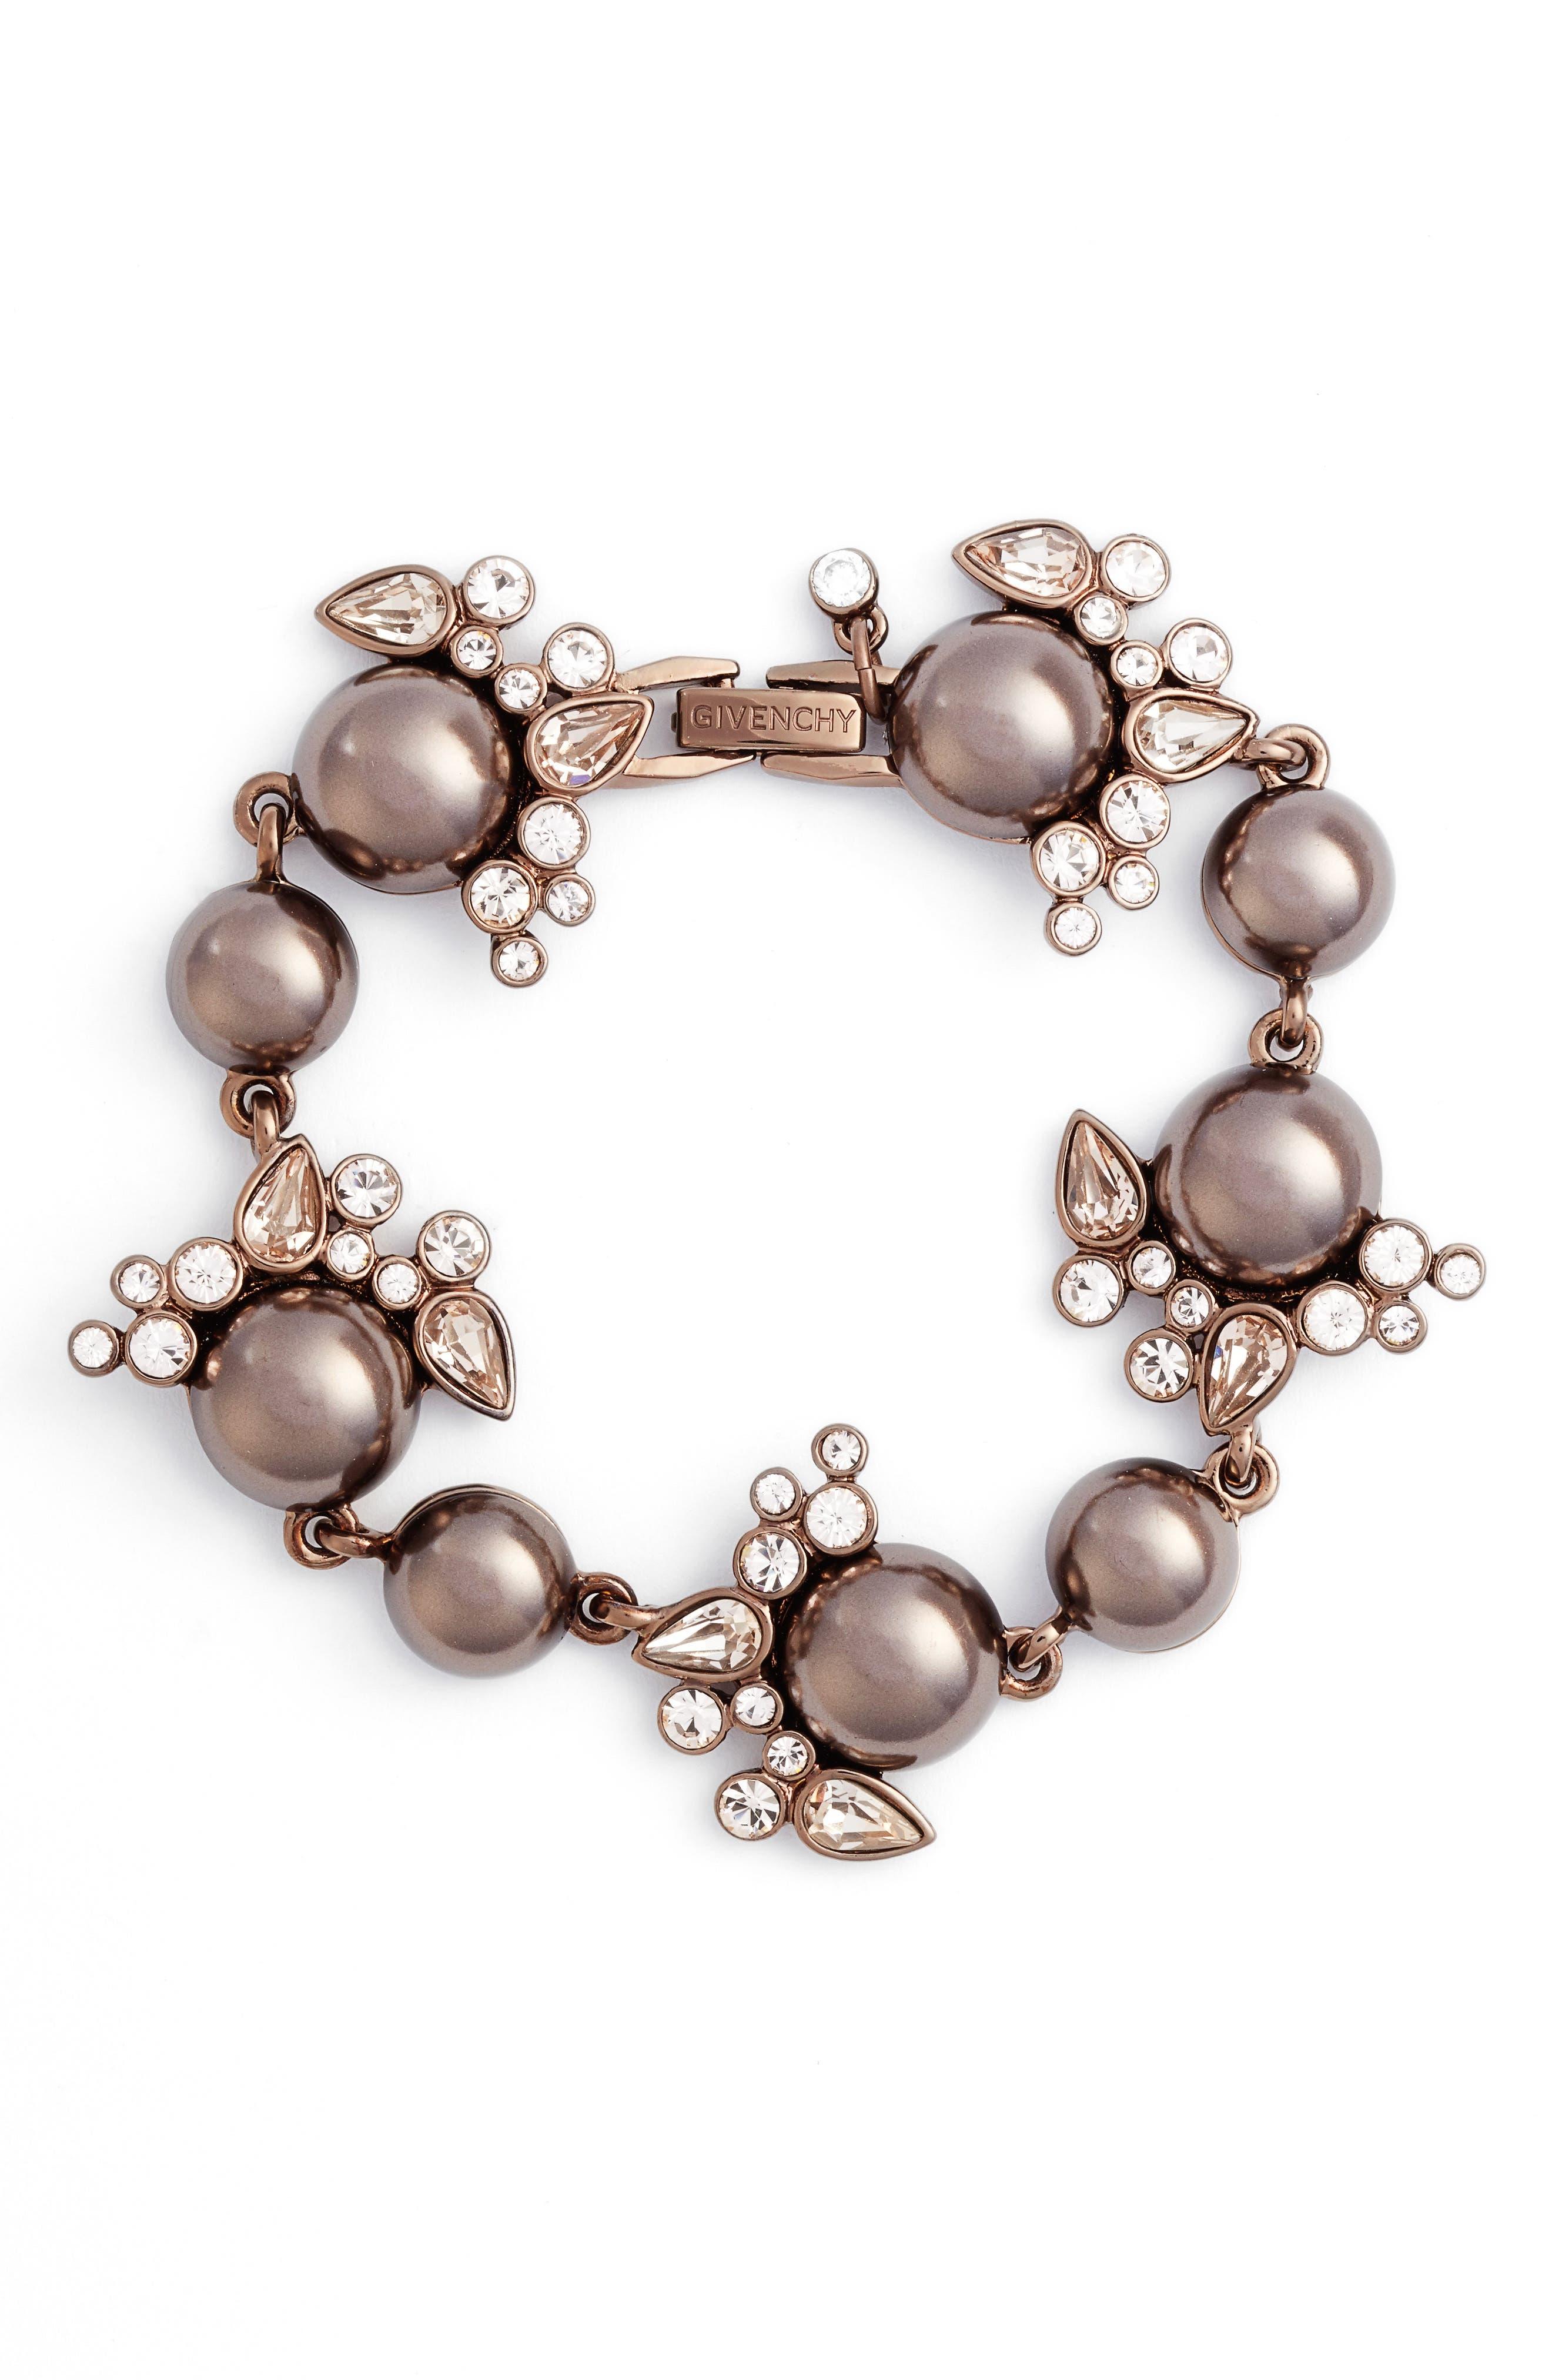 Imitation Pearl & Crystal Bracelet,                             Main thumbnail 1, color,                             200